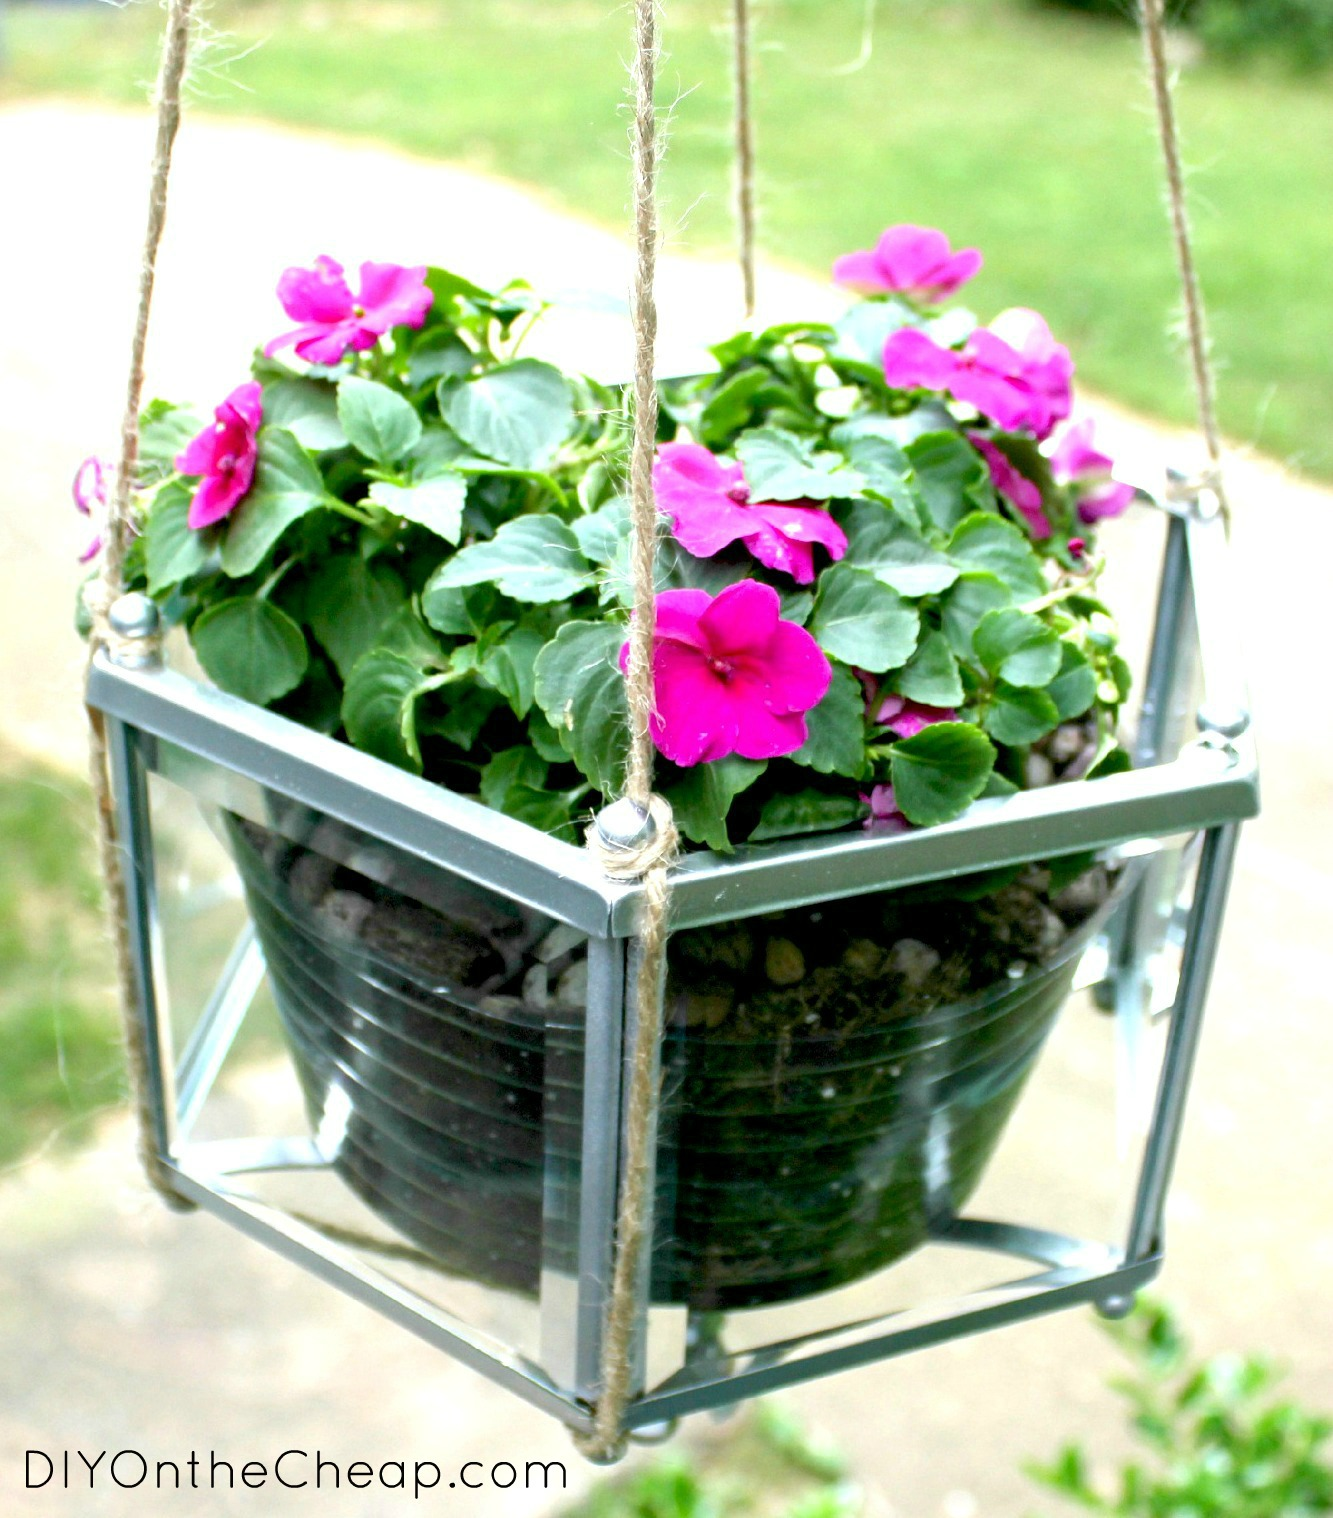 Hanging Light With Planter: Trash To Treasure: Pendant Light Planter